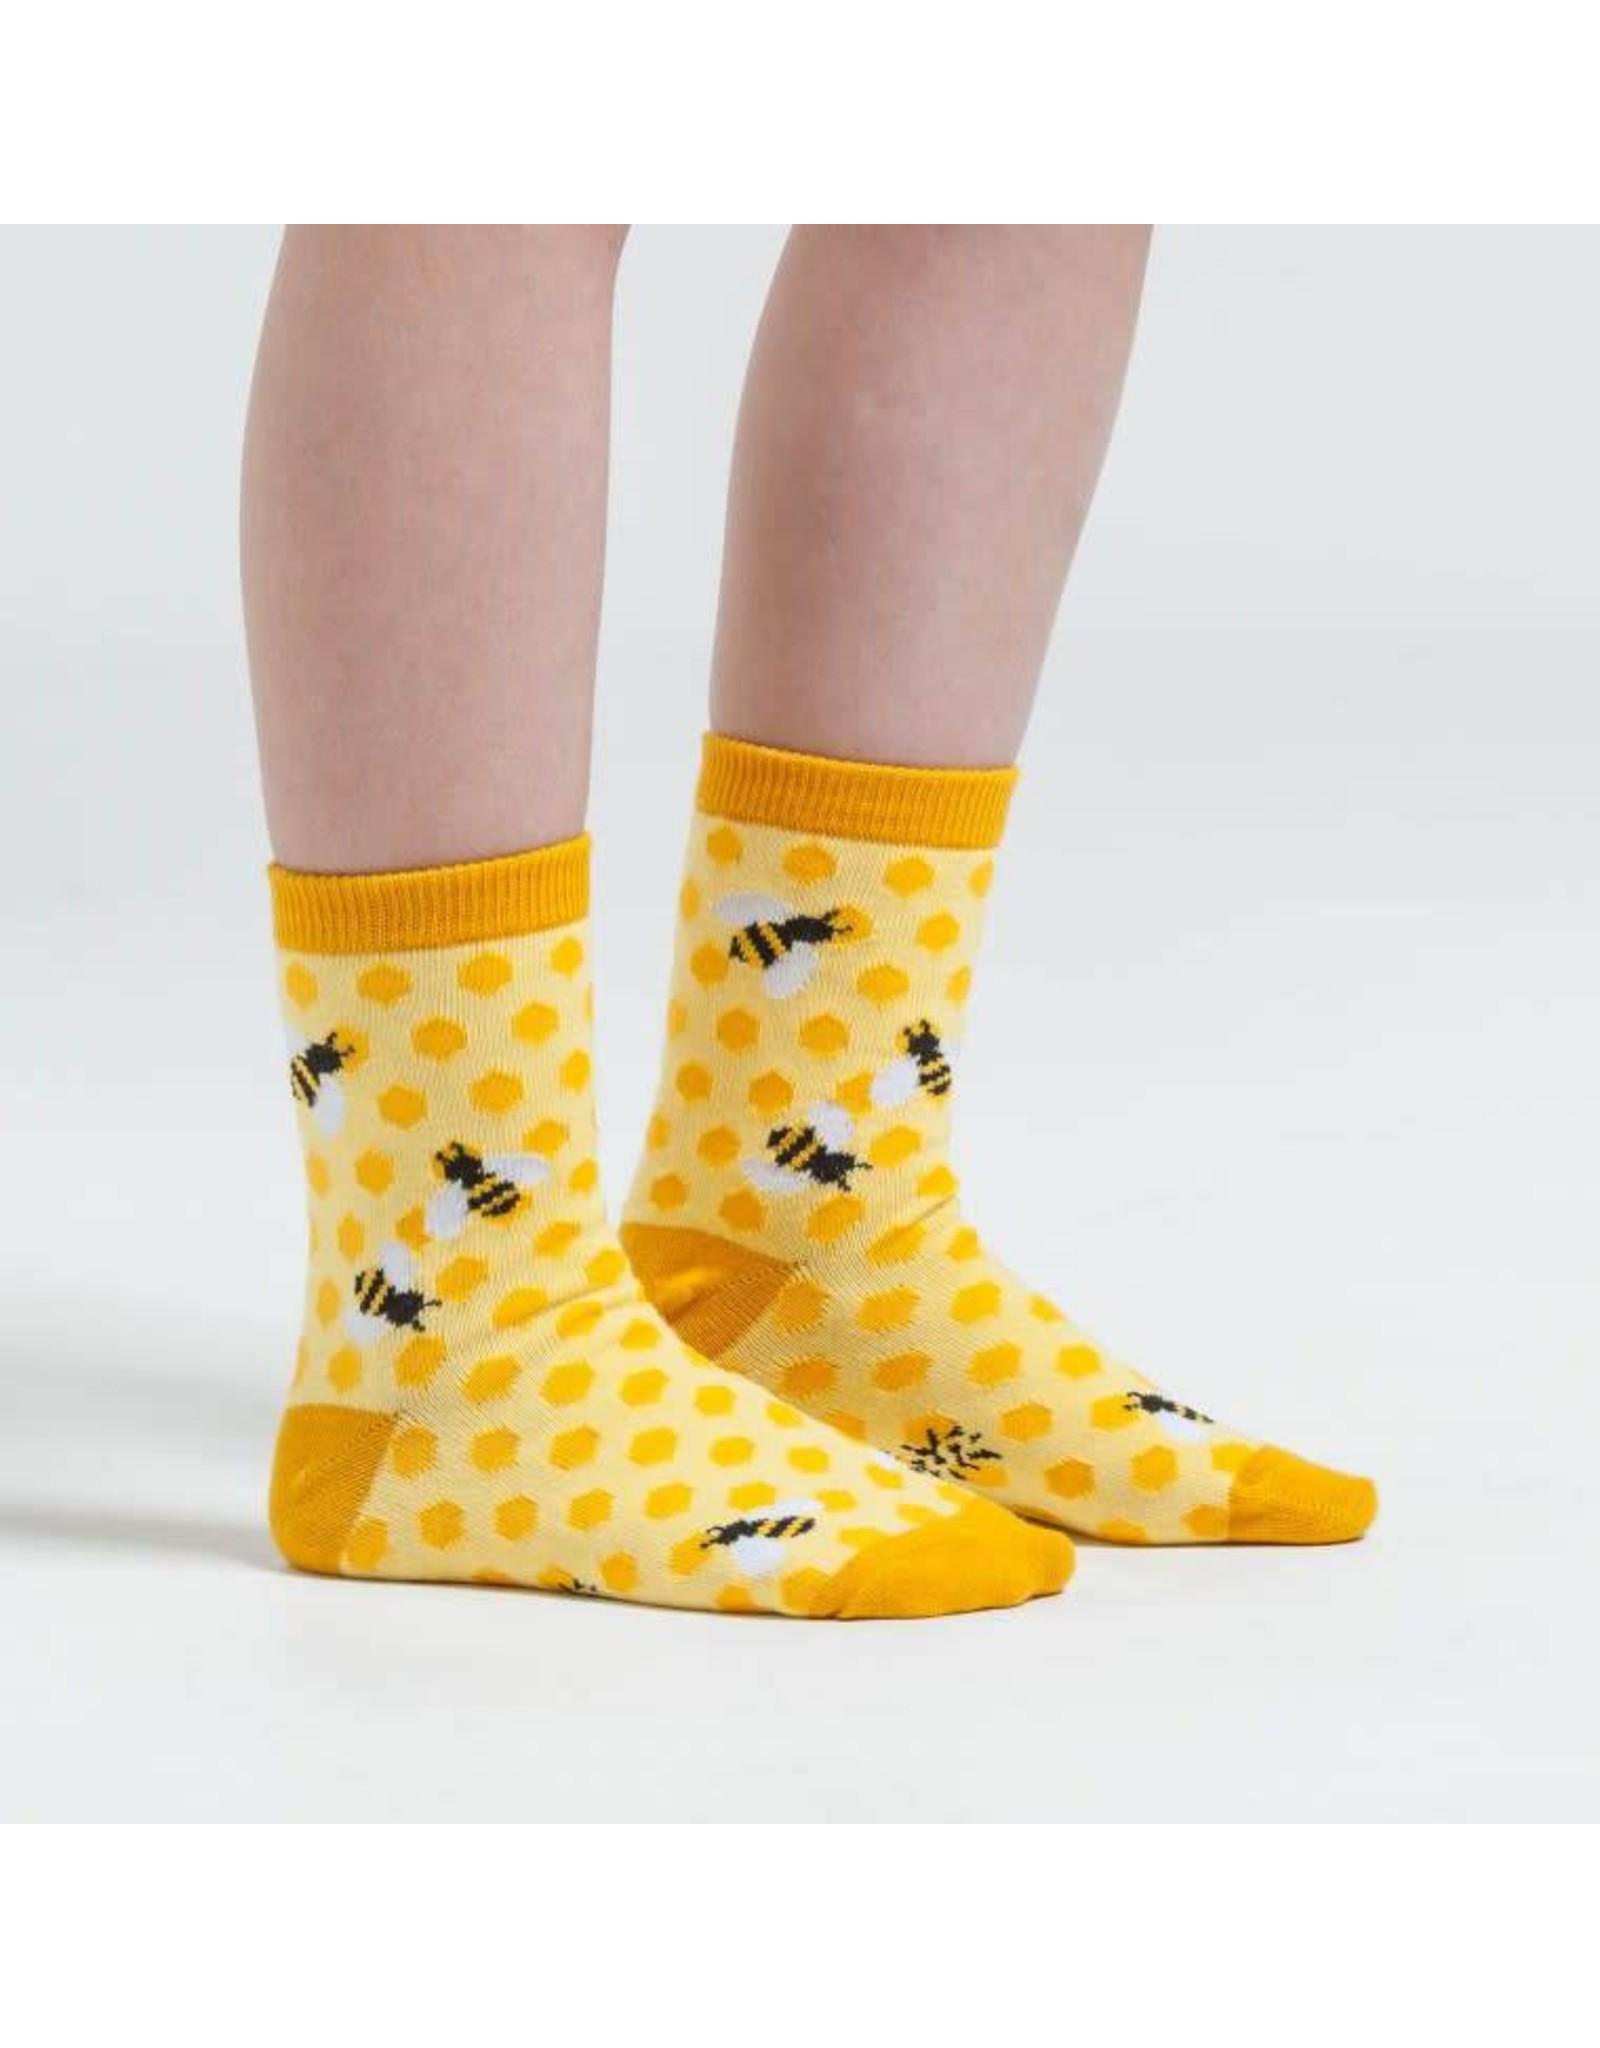 SOCK IT TO ME - Youth Bee's Knees Crew Socks